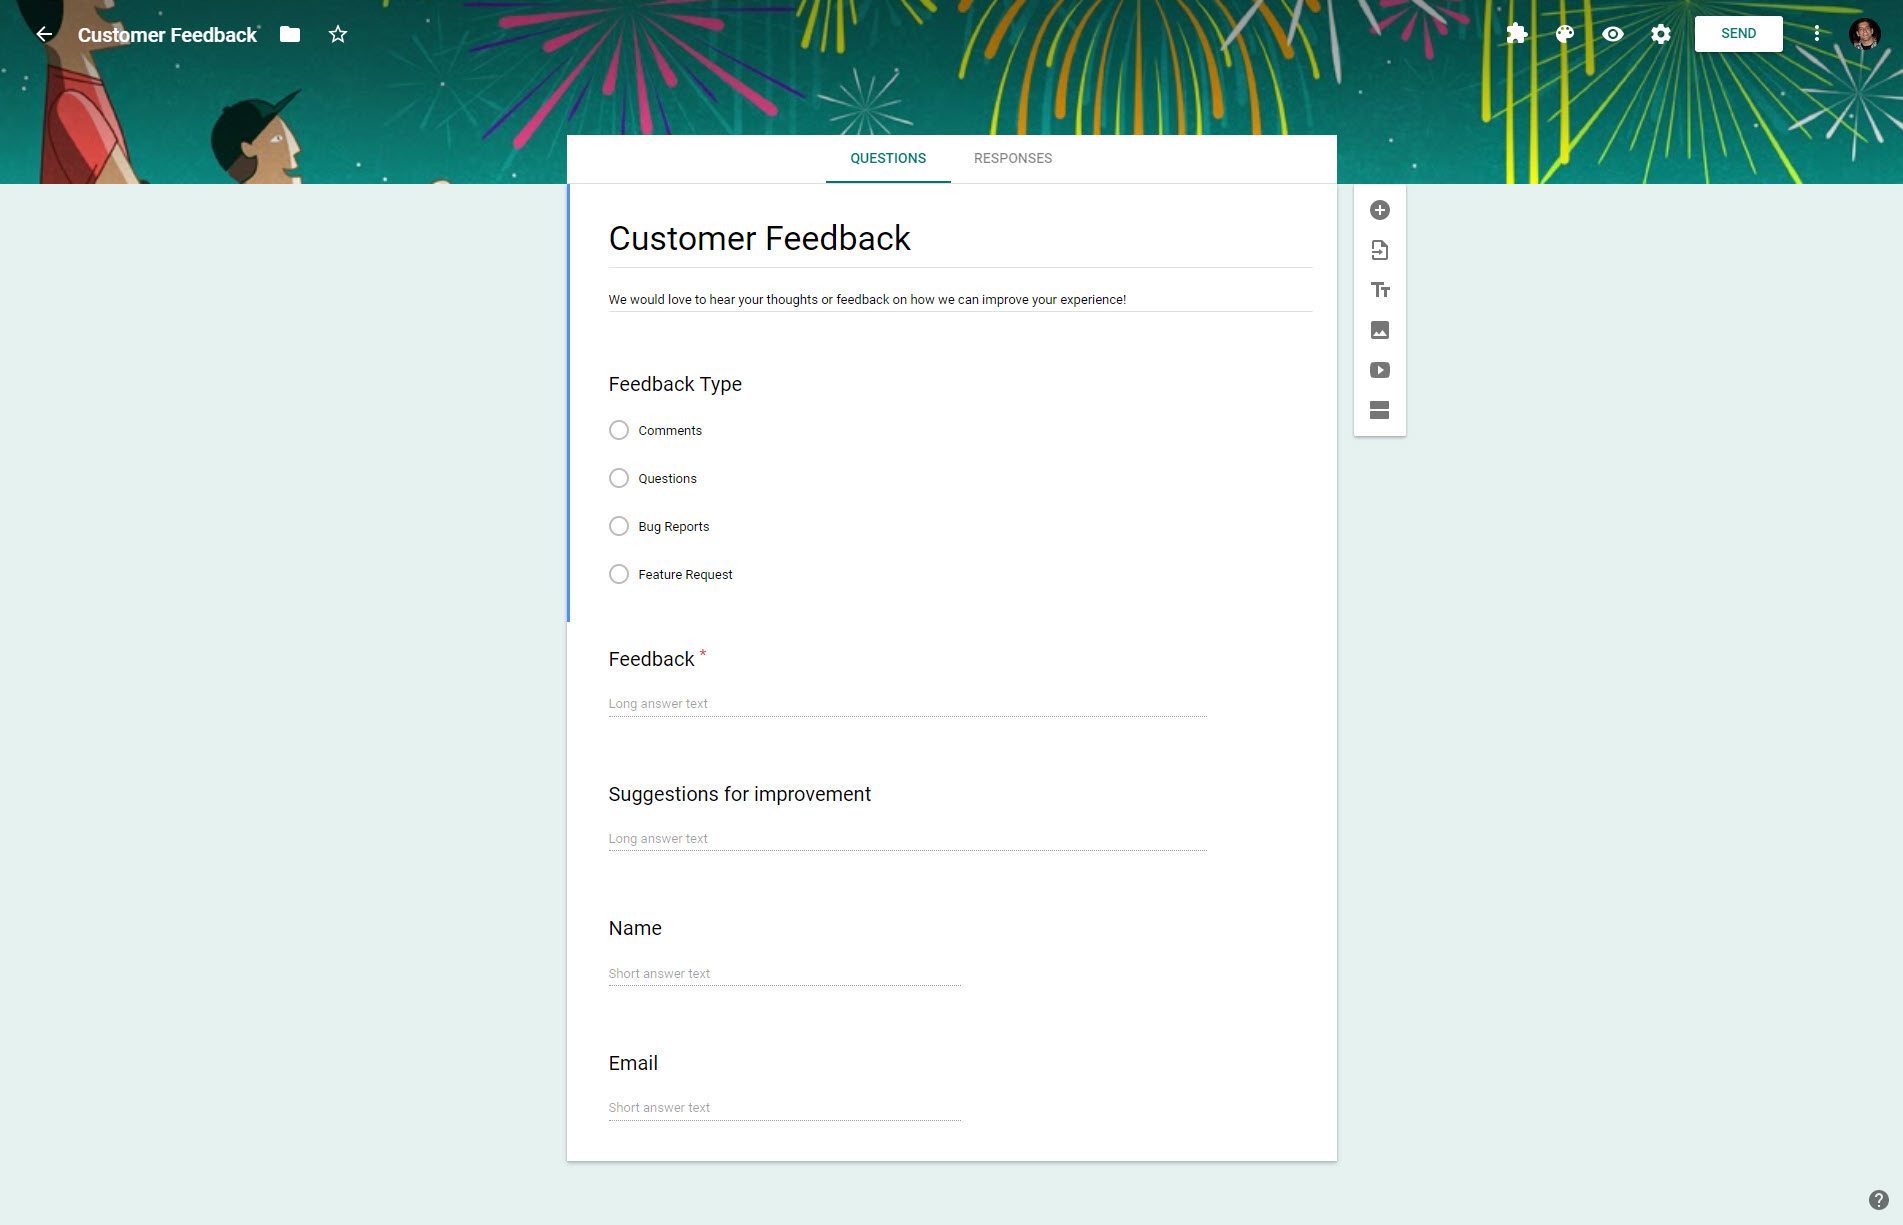 The default customer feedback template